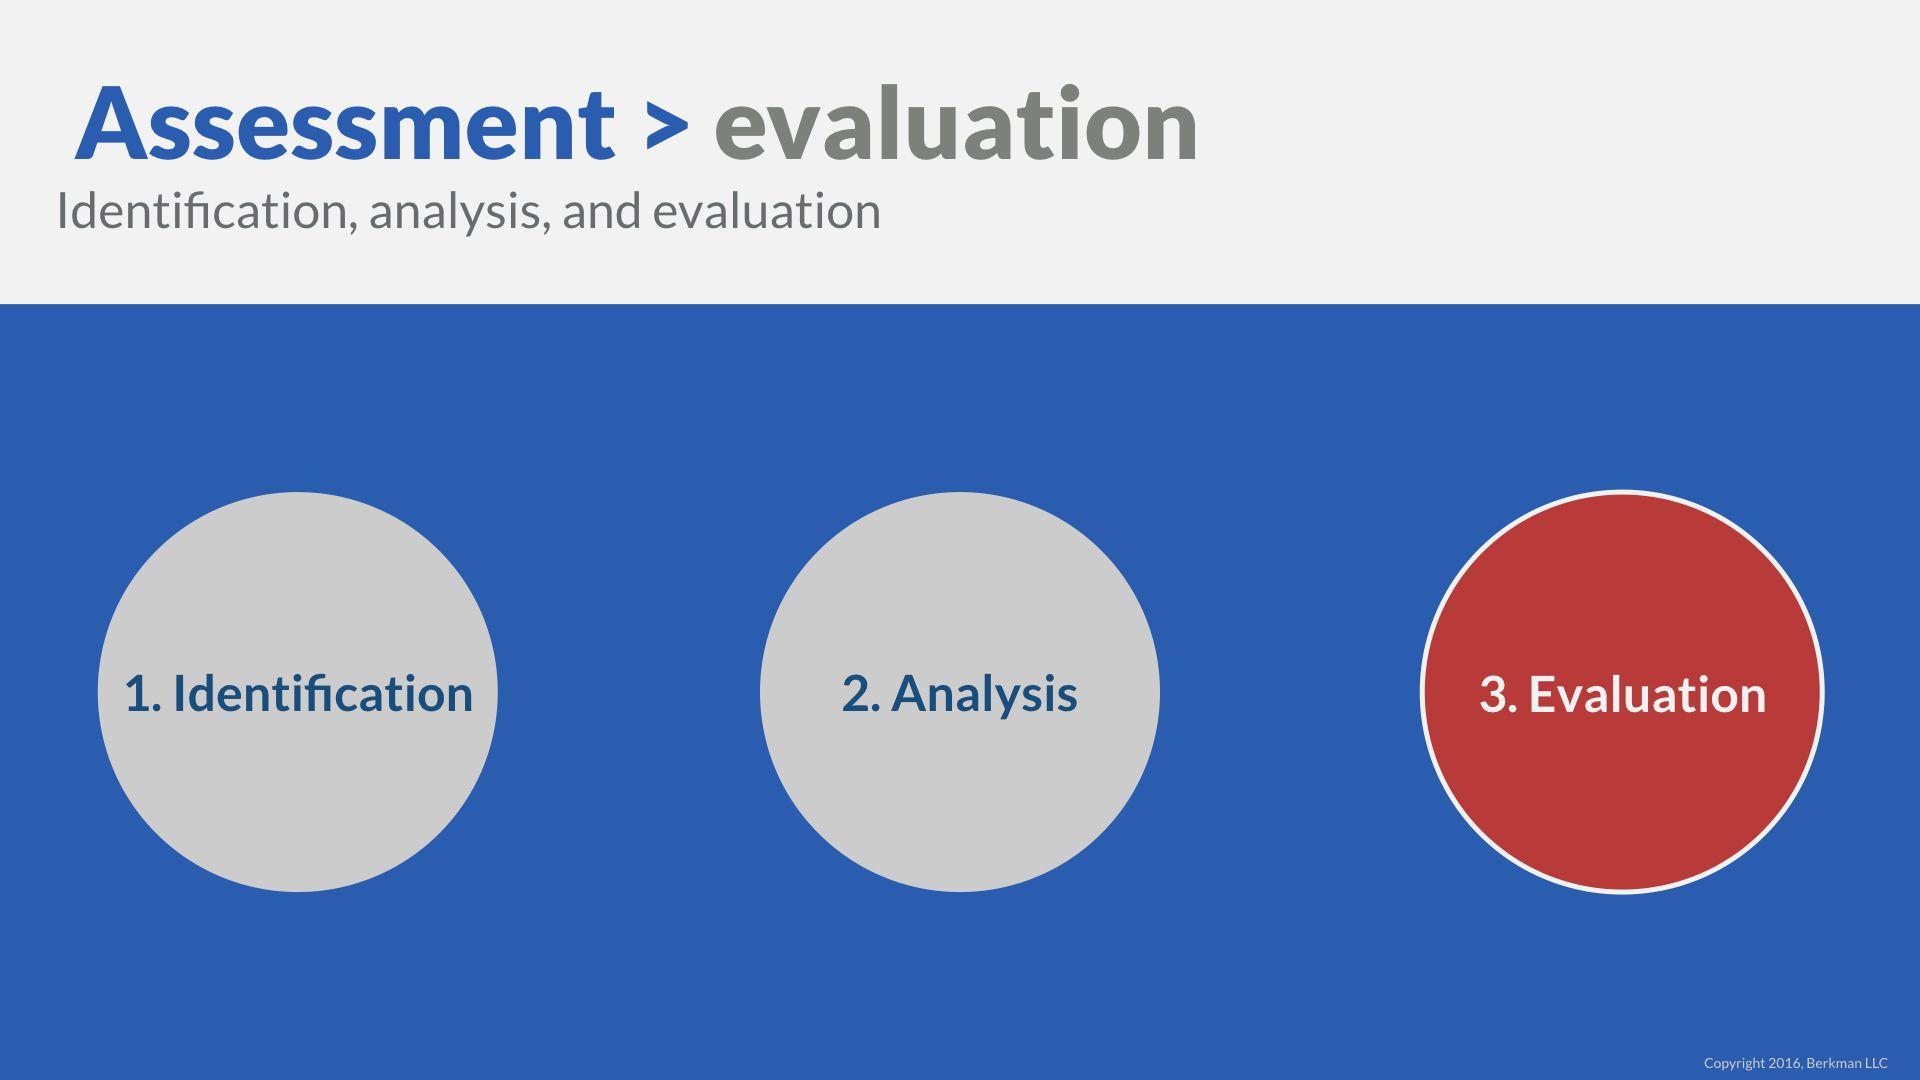 Risk Evaluation: phase 3 of risk assessment